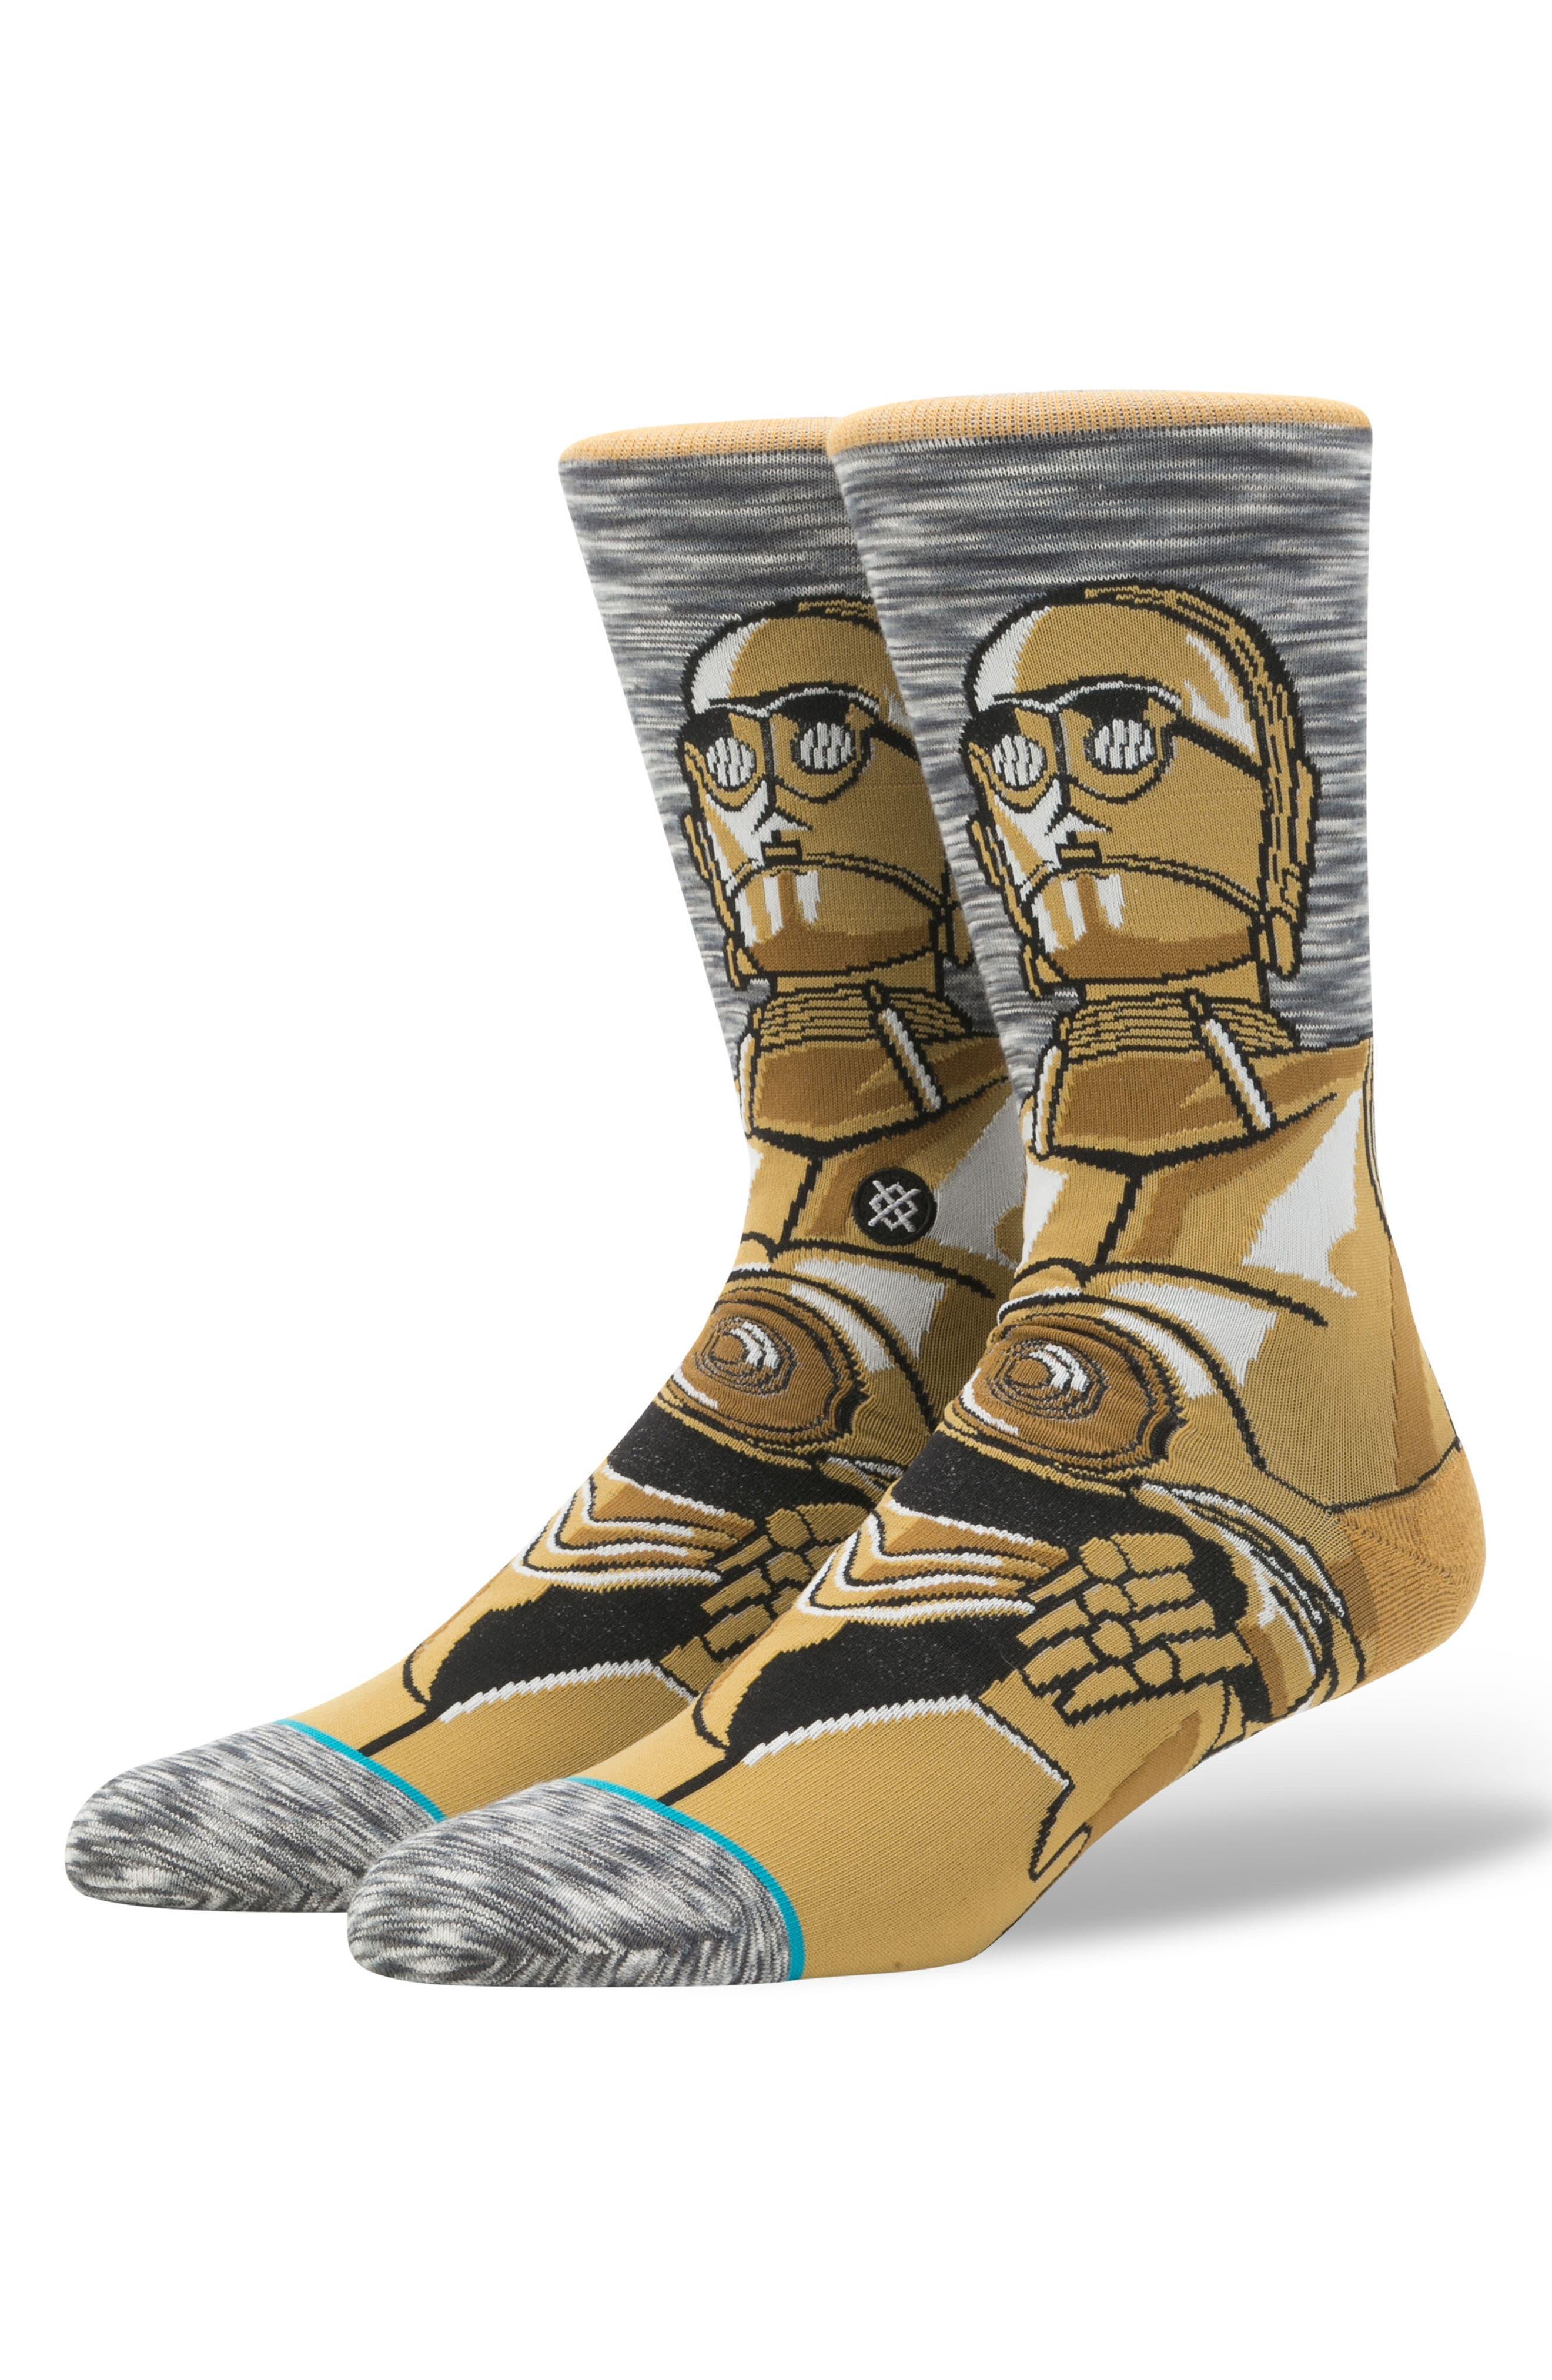 Star Wars – Android Socks,                         Main,                         color, GREY